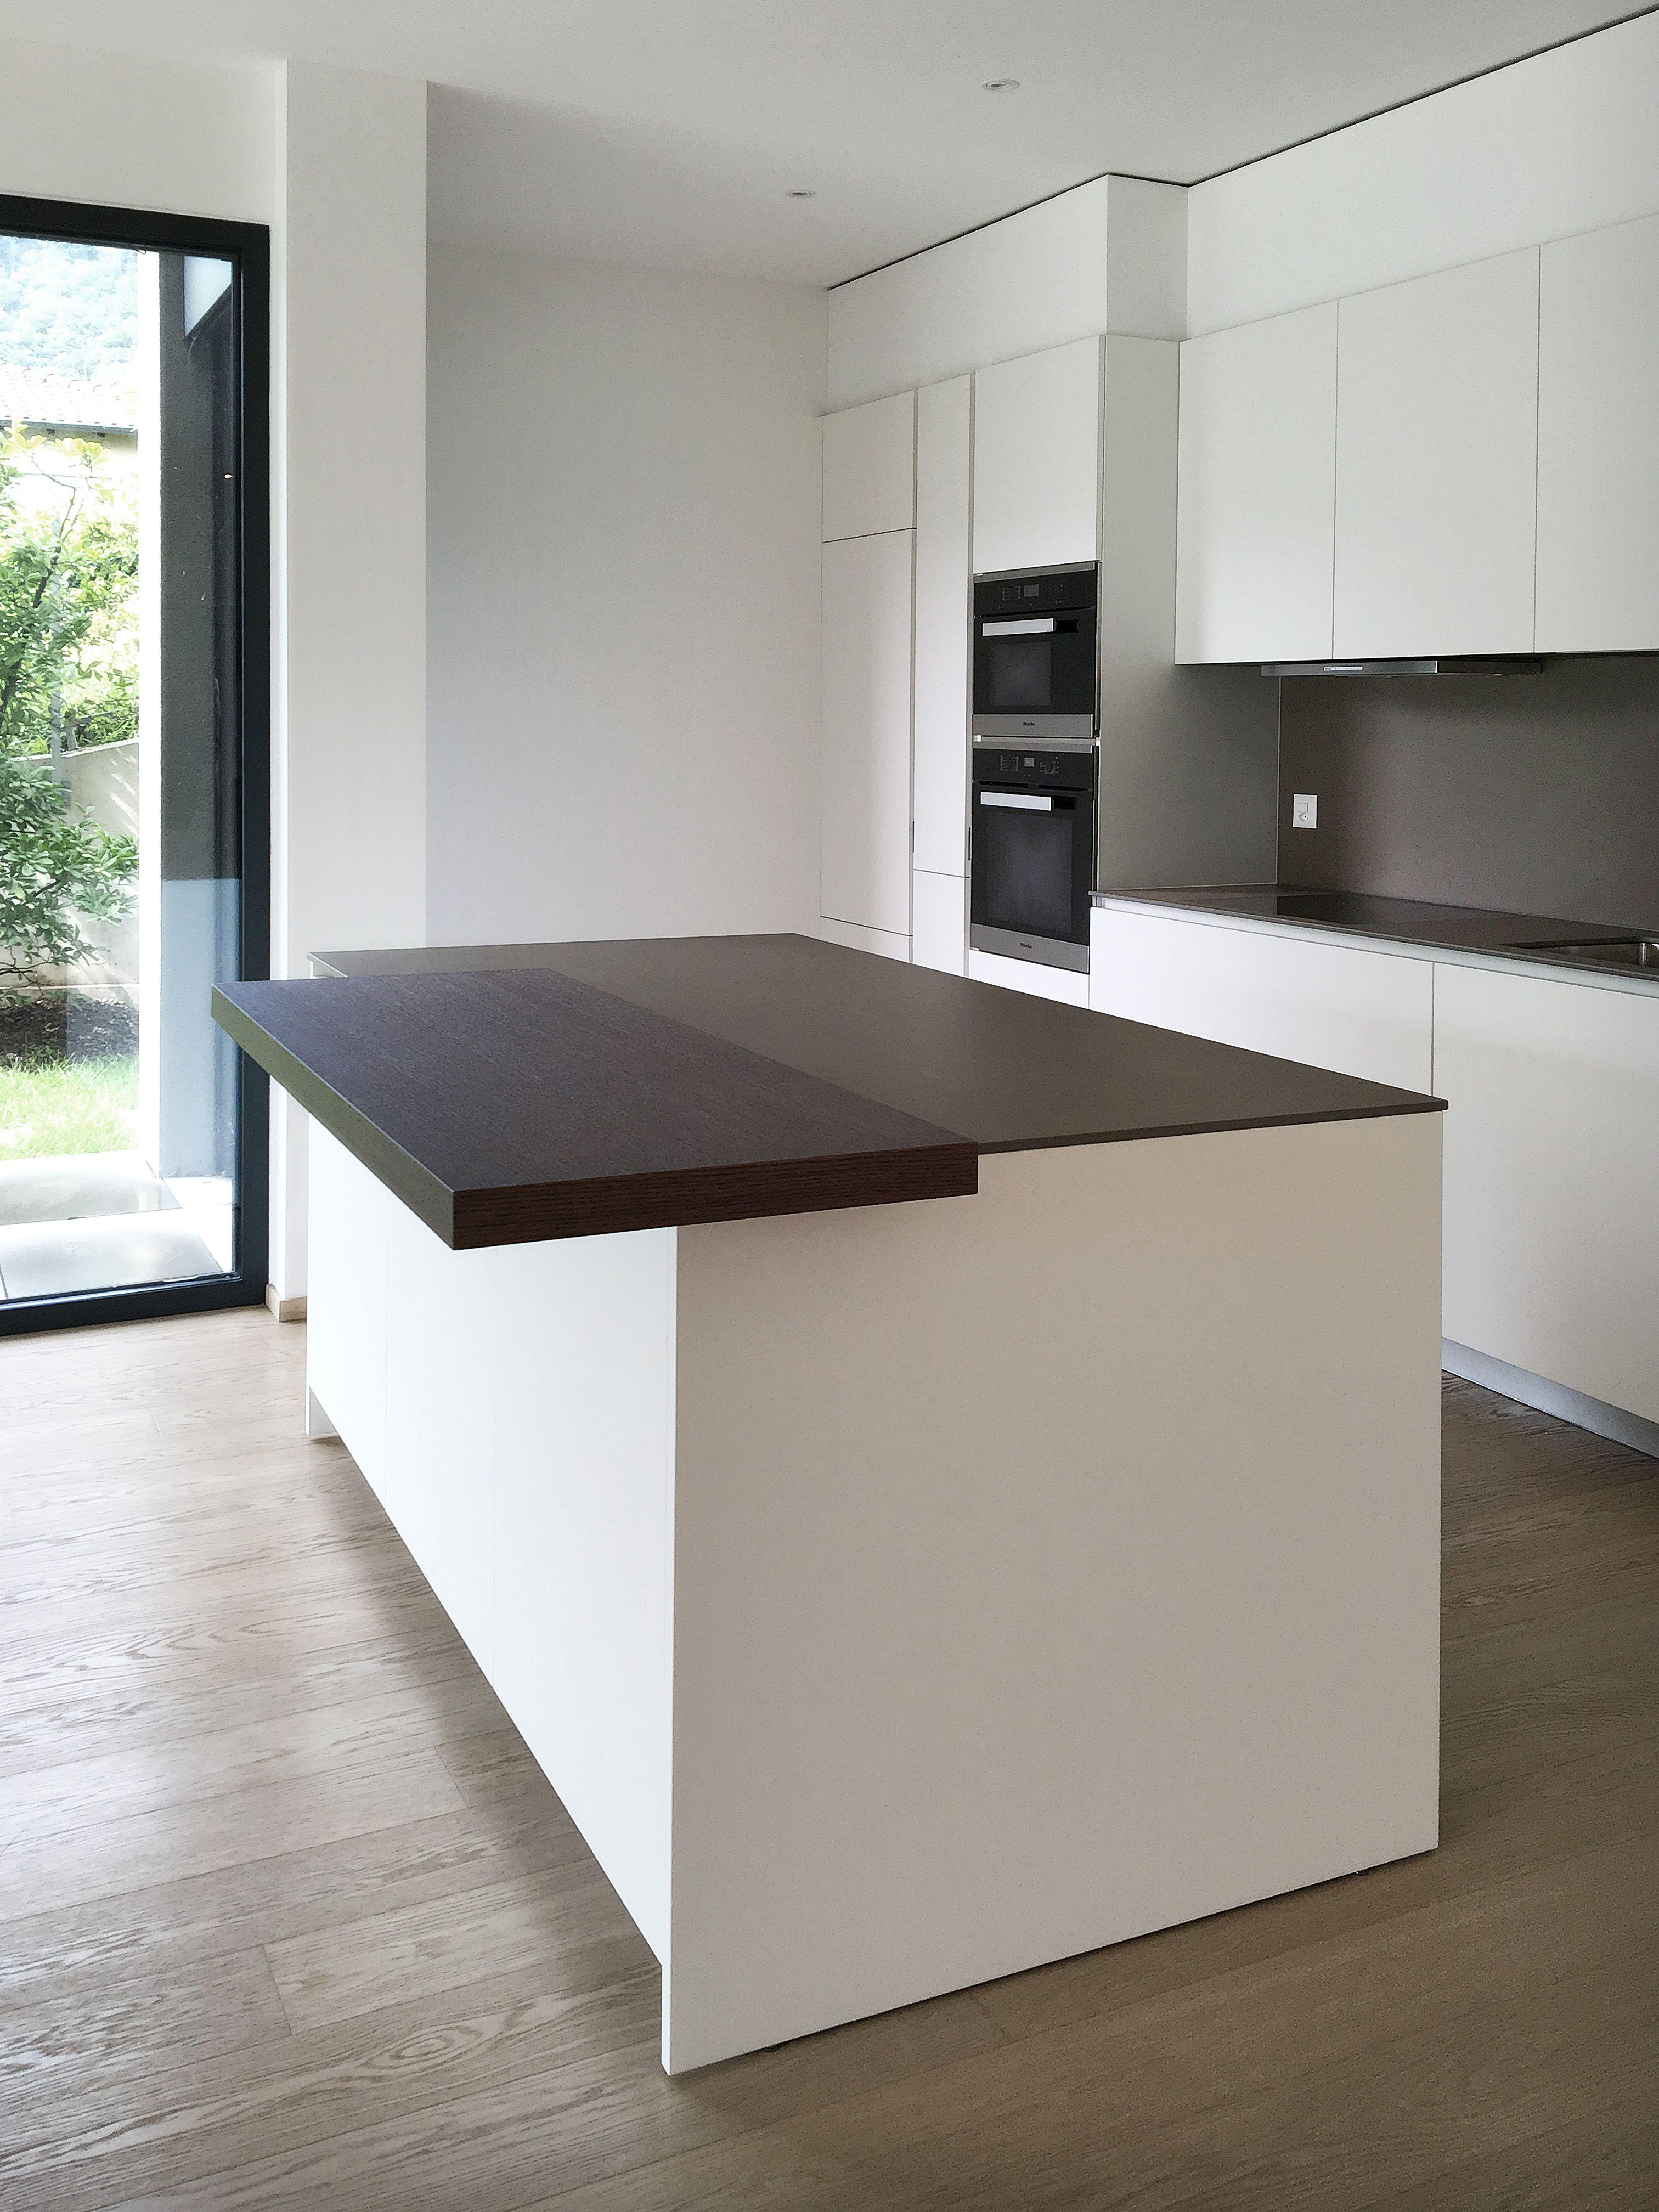 Cucina design Varenna Poliform laccata bianca con piano in ceramica ...